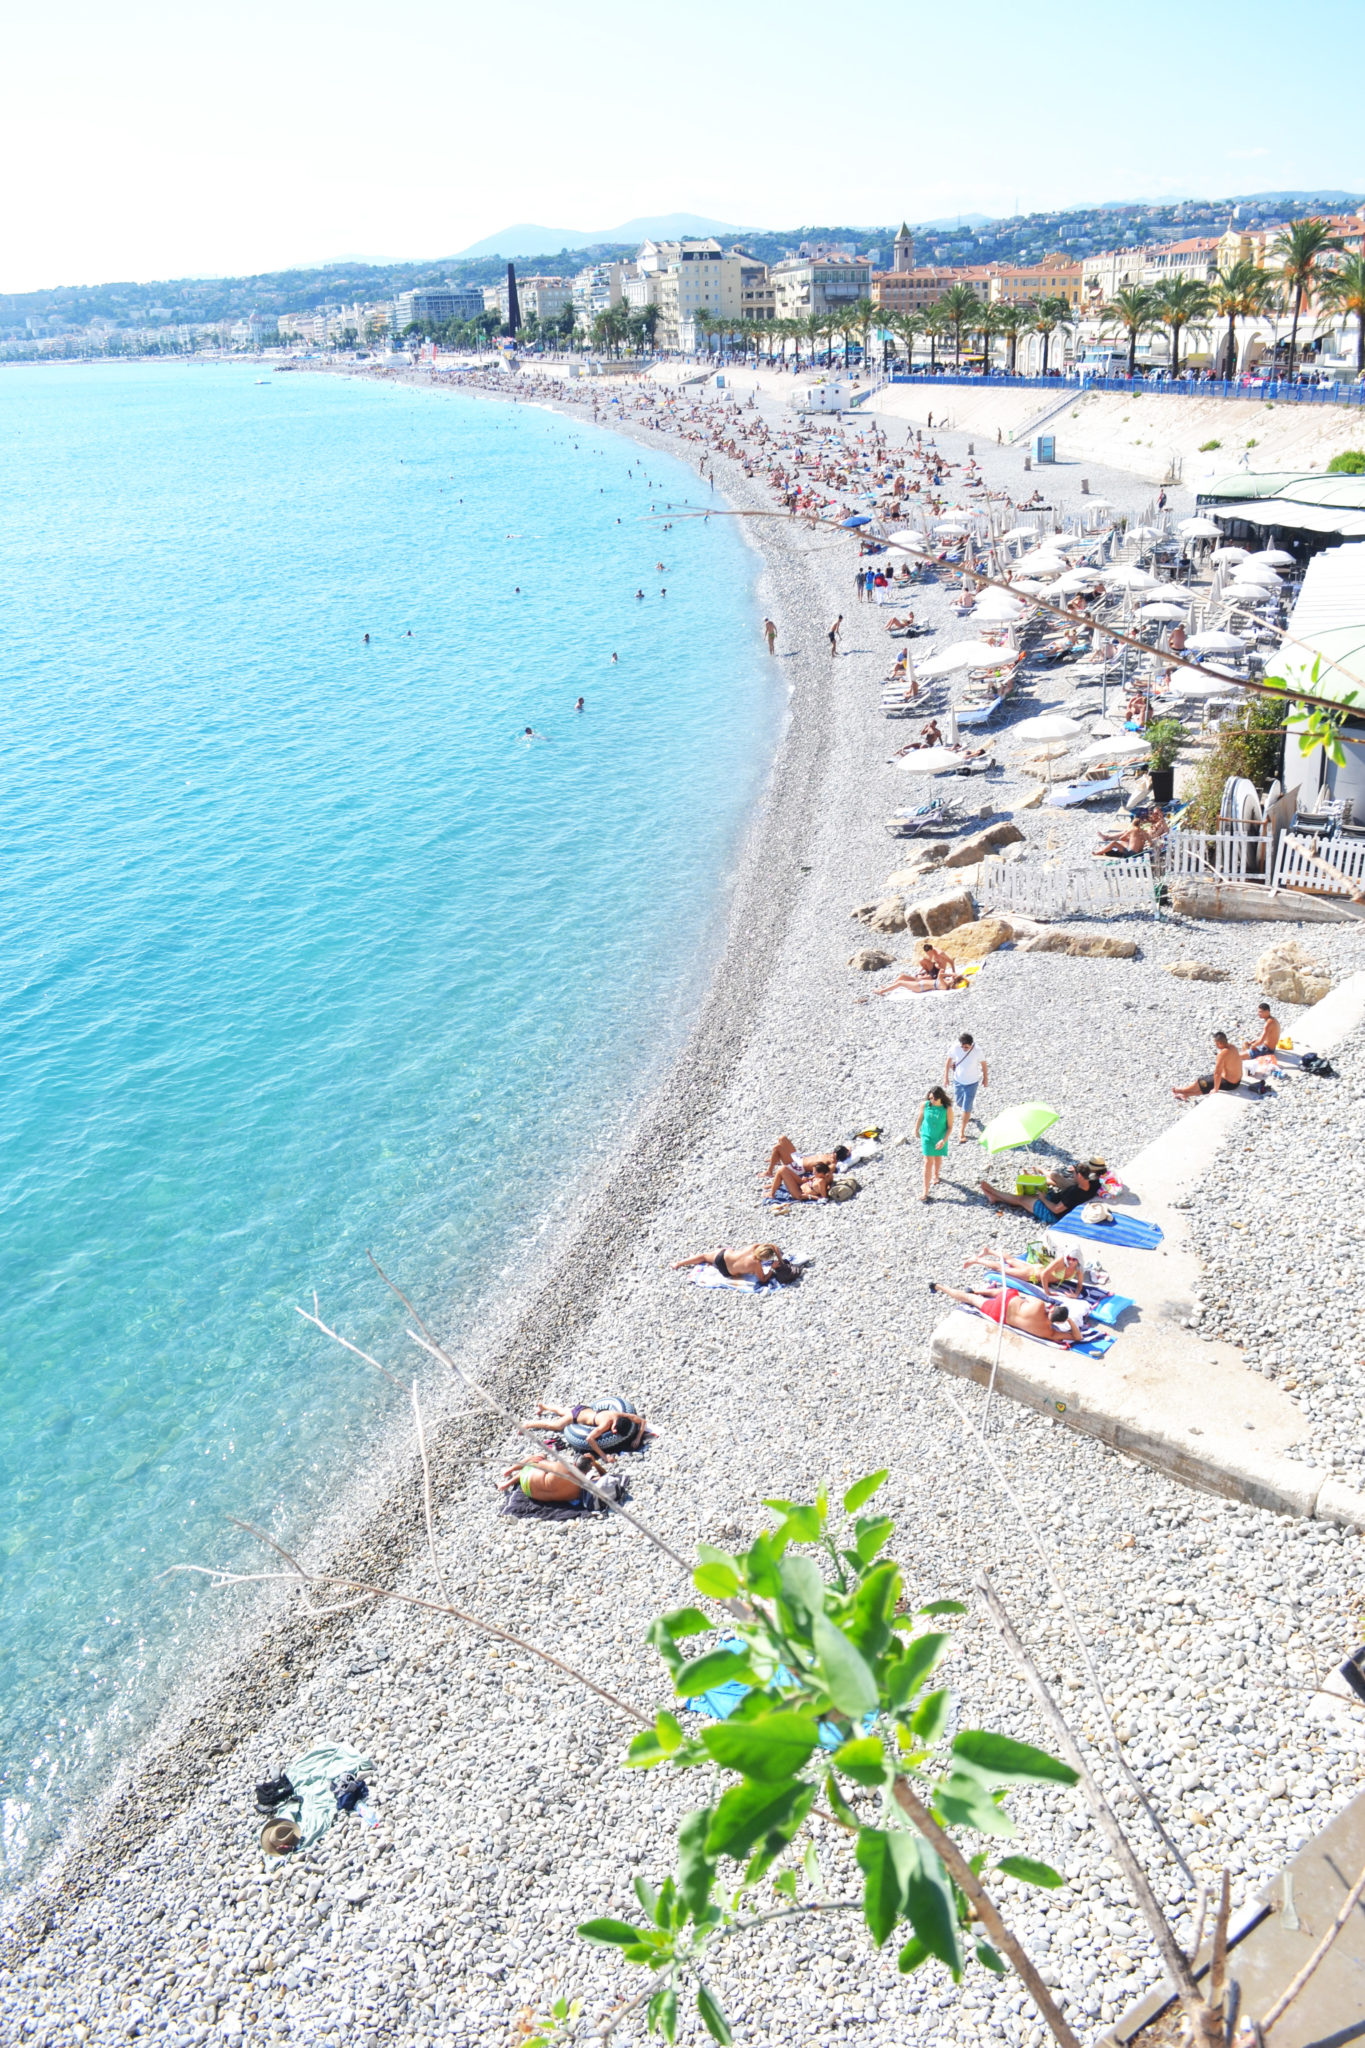 Das Leben geniessen an der schönen Côte d' Azur!